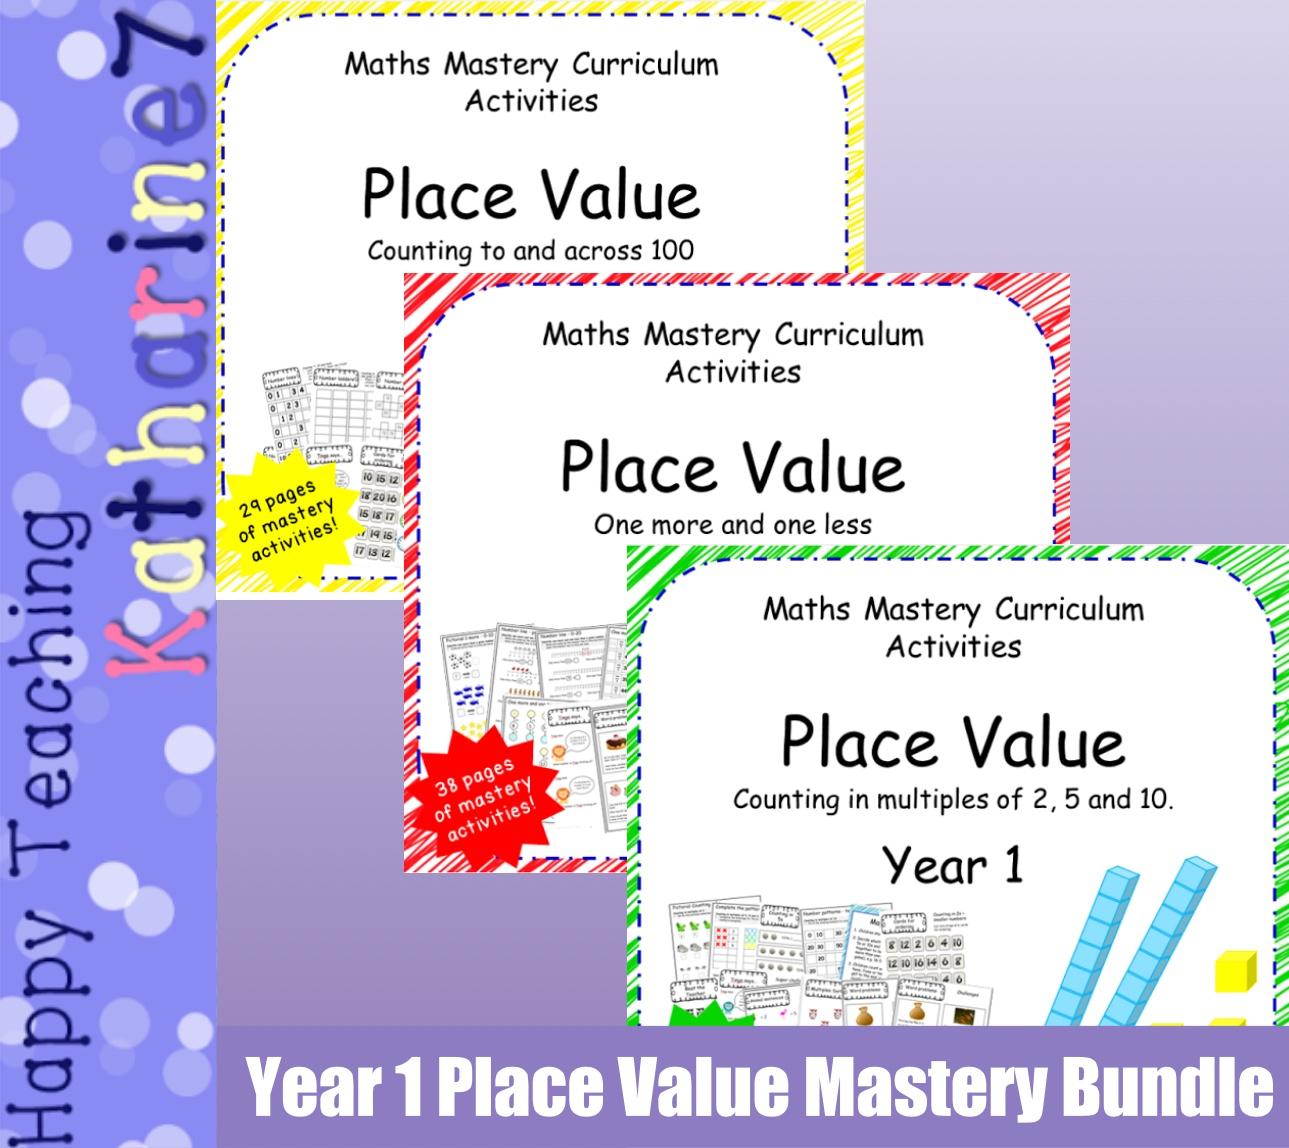 Place Value mastery bundle